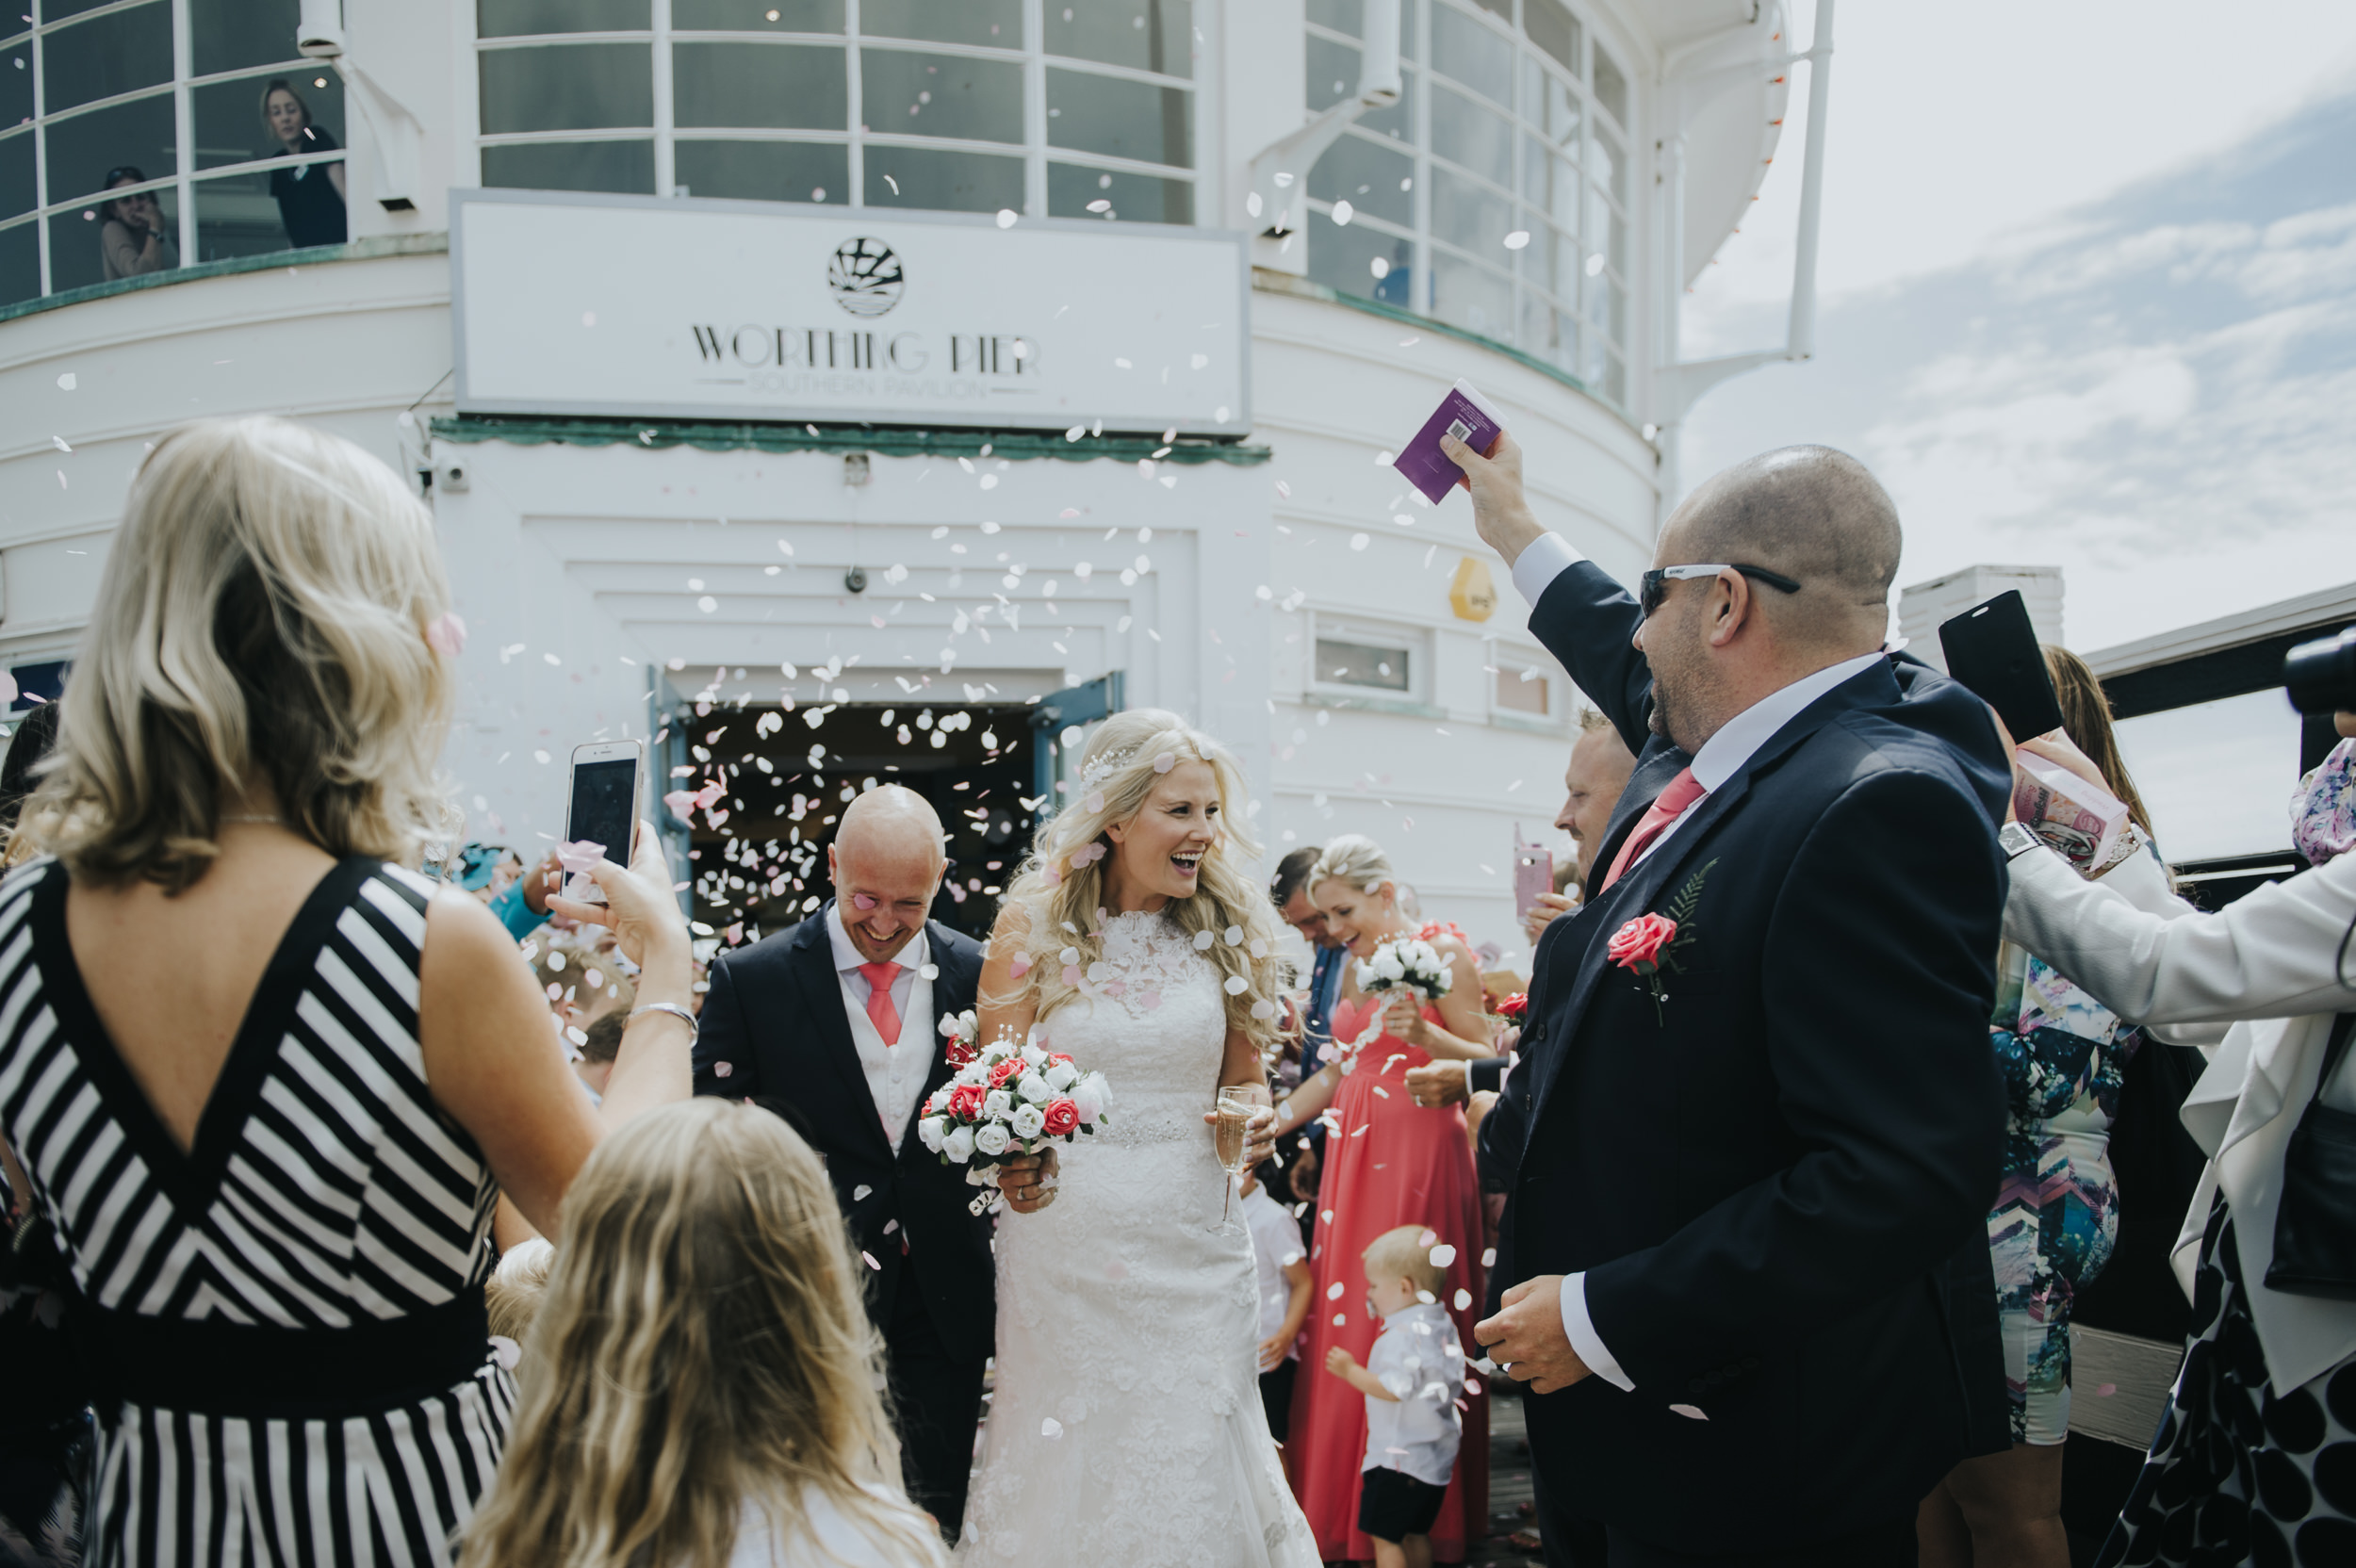 worthing-pier-wedding-005.JPG